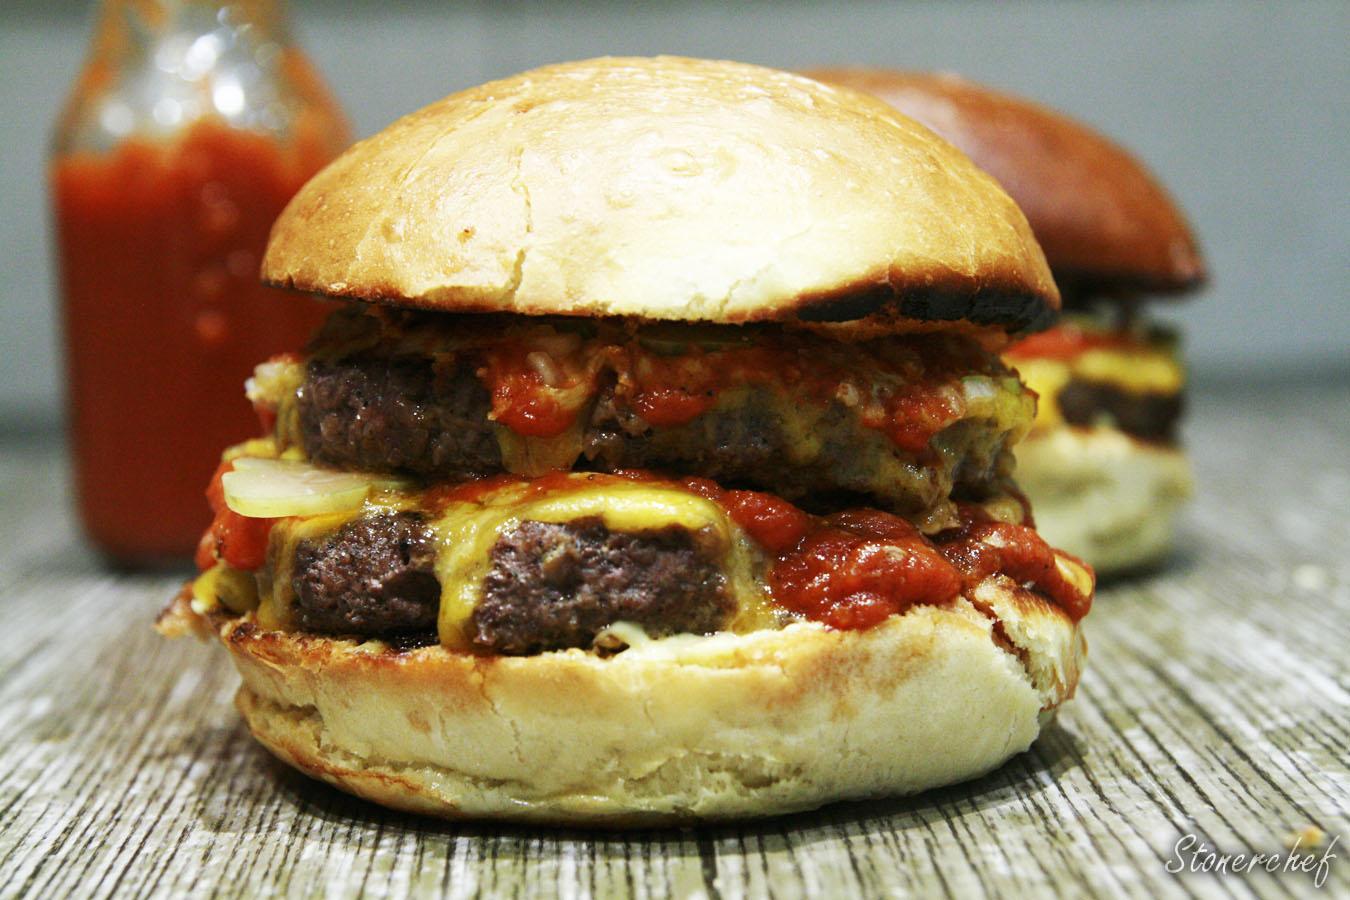 http://www.stonerchef.pl/wp-content/uploads/2017/05/podwojny-cheeseburger.jpg